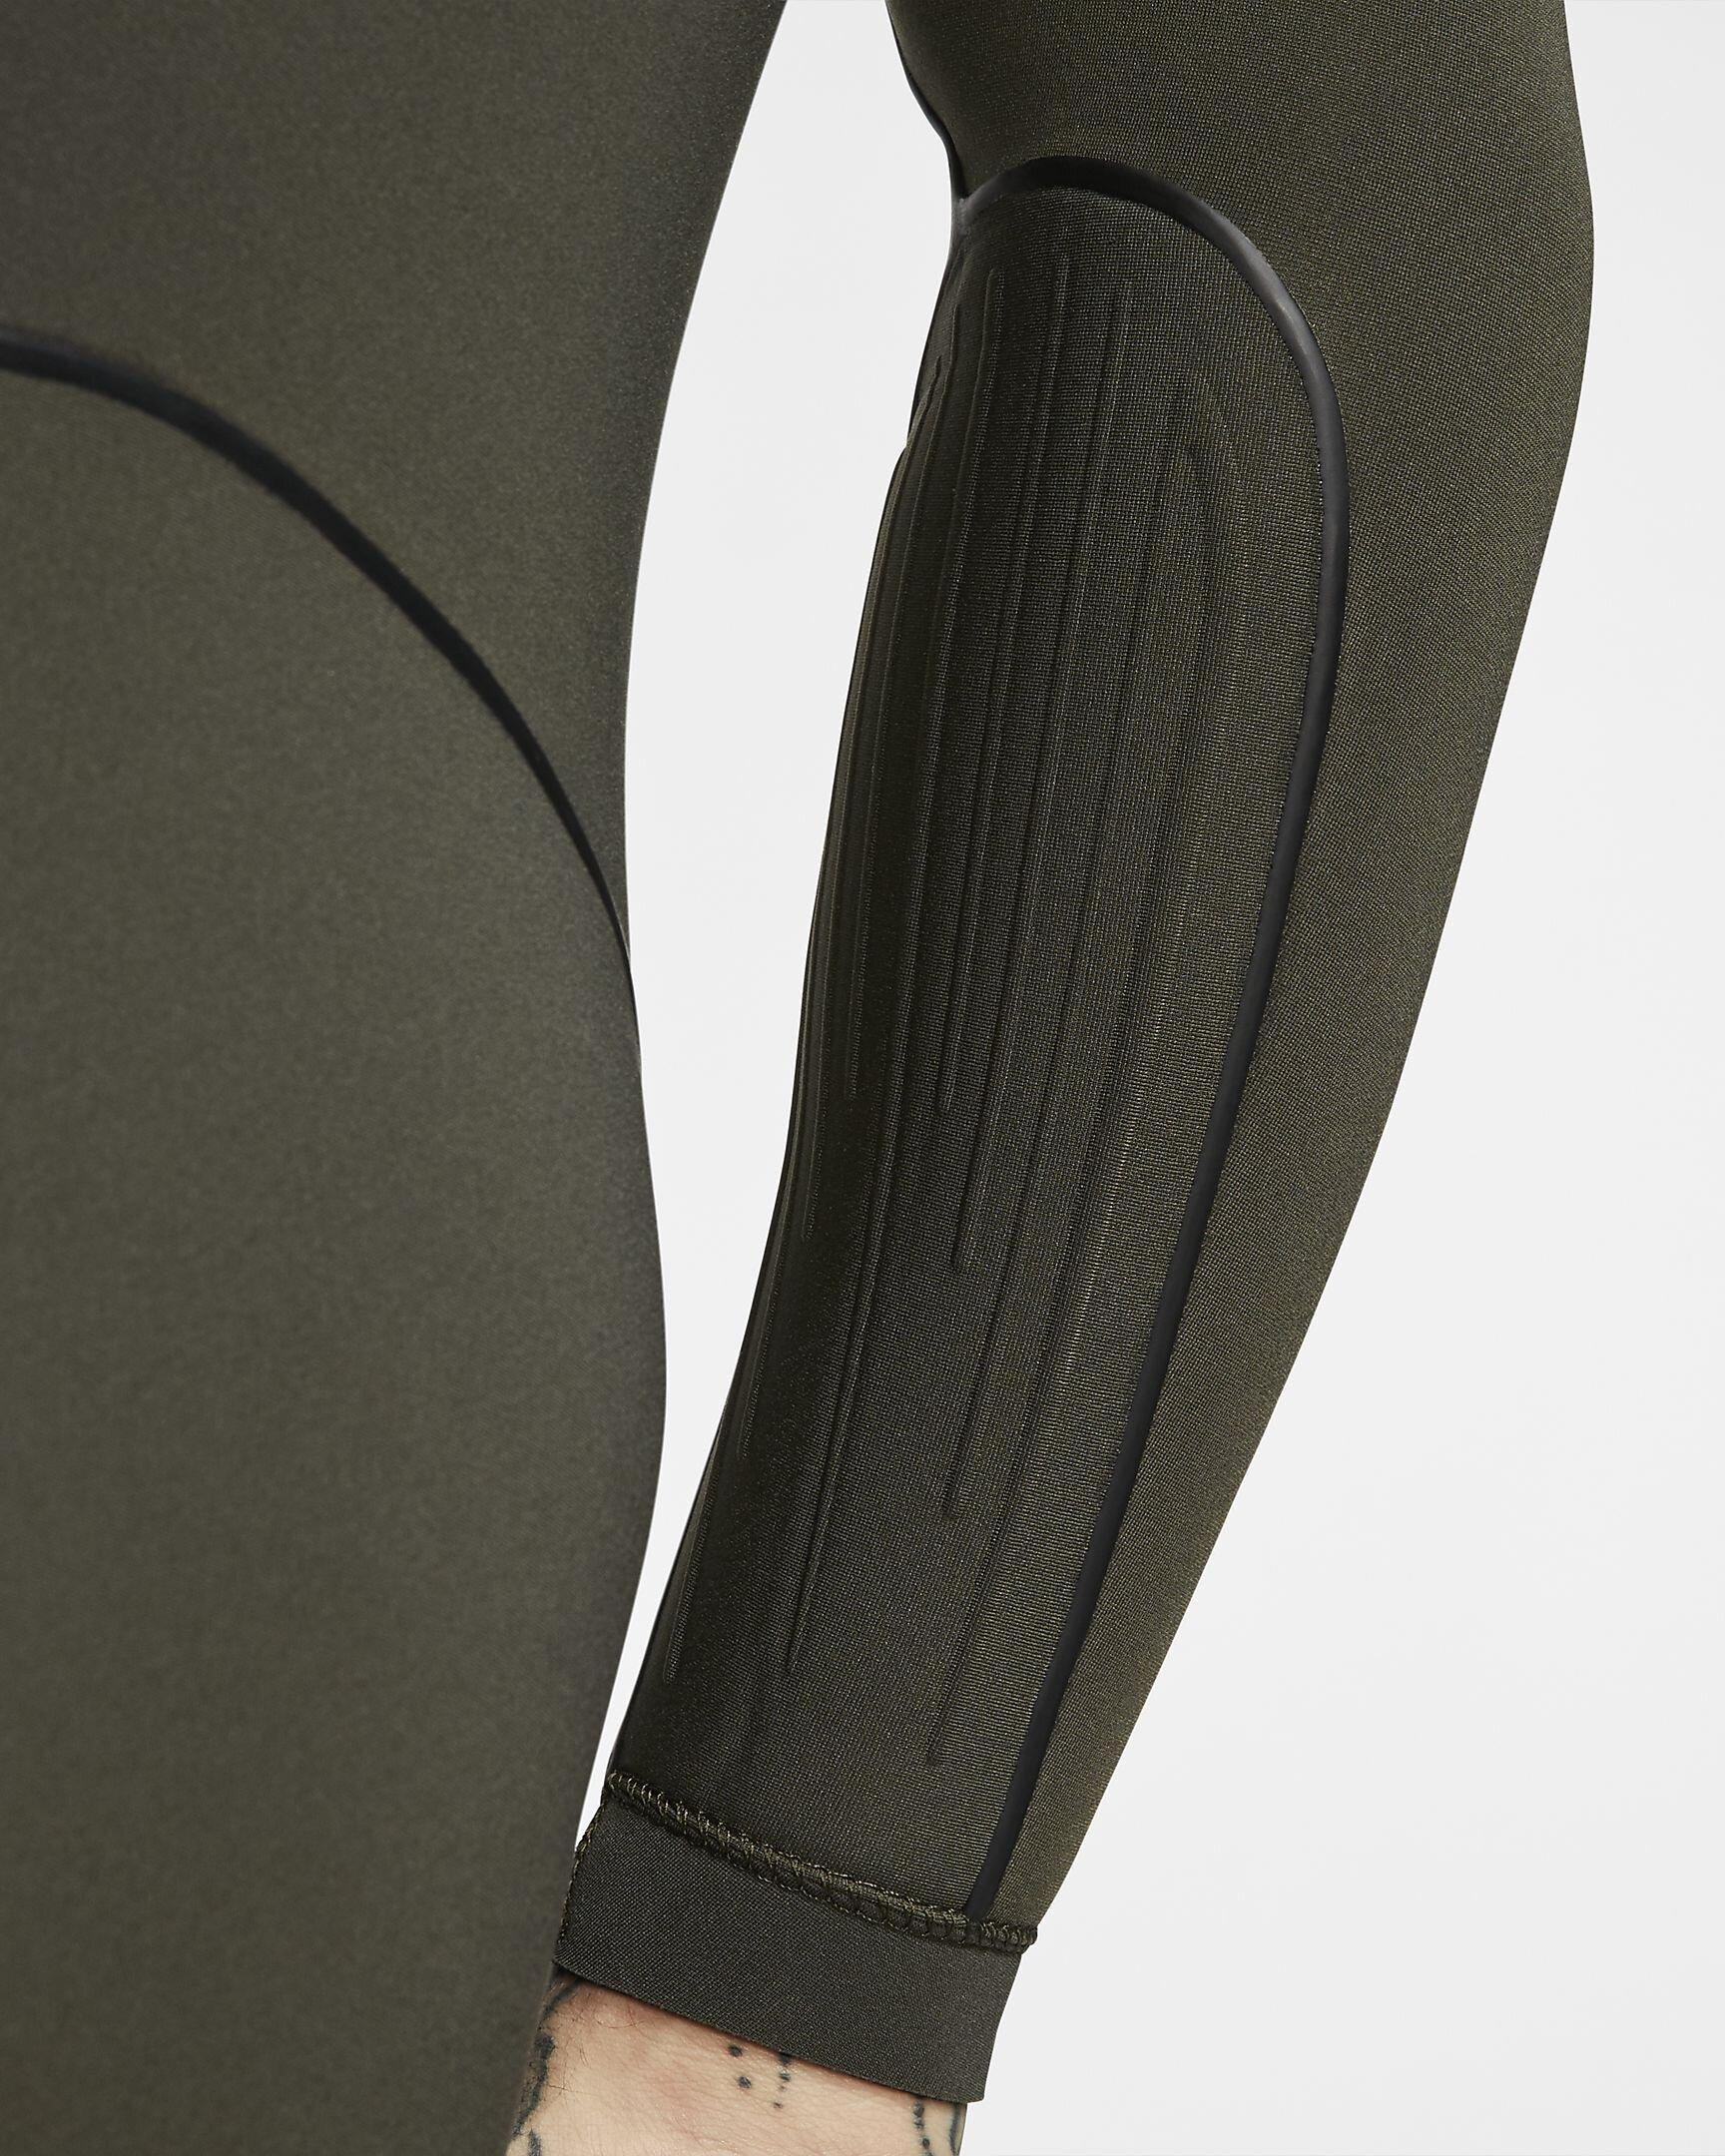 hurley-advantage-max-3-2mm-fullsuit-boys-wetsuit-drcrn8.jpg